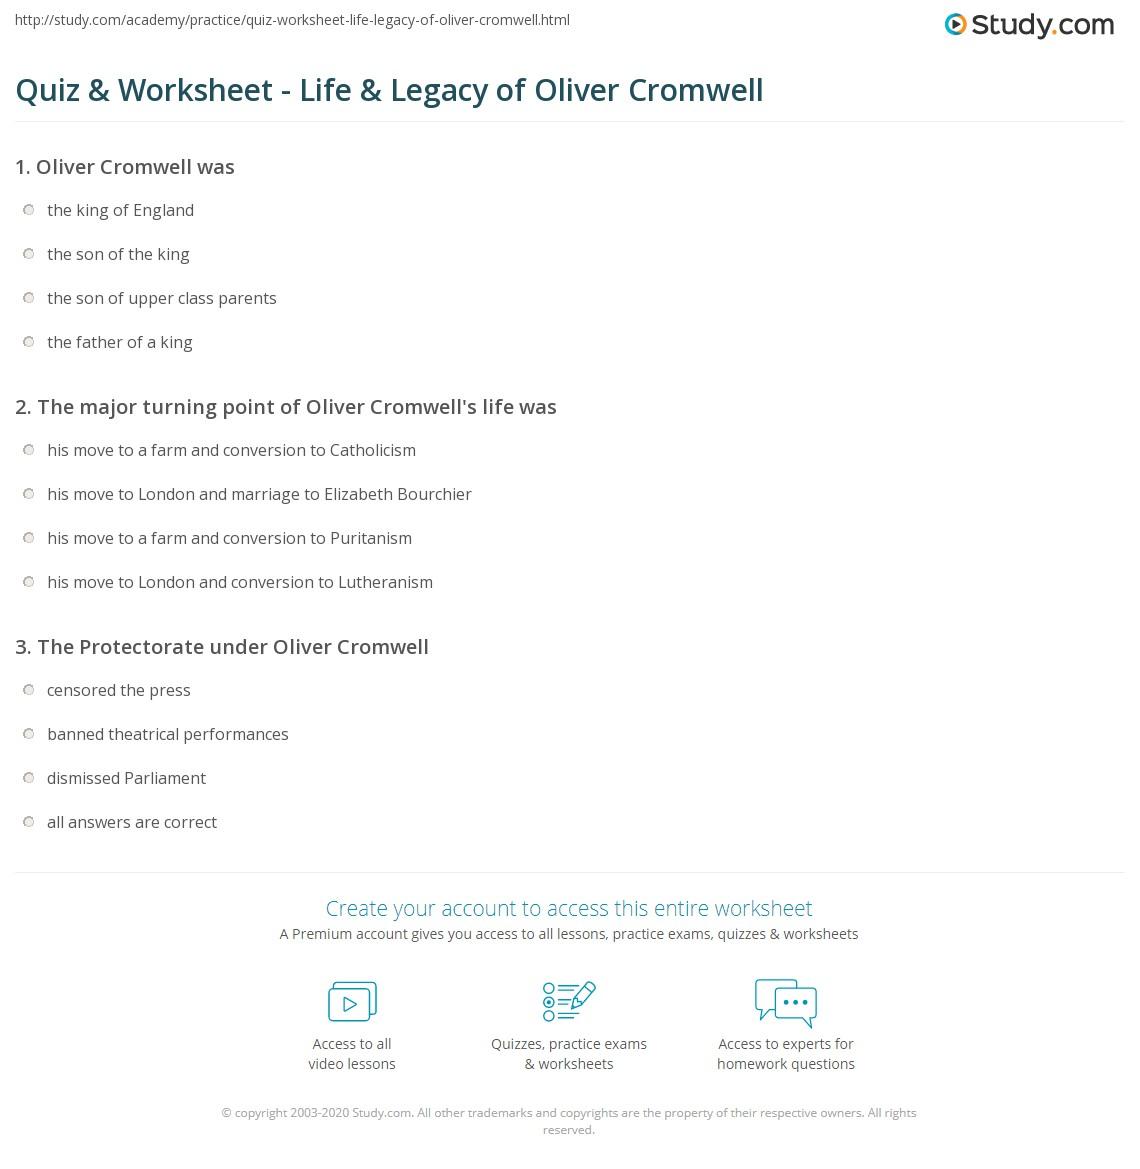 quiz worksheet life legacy of oliver cromwell com print oliver cromwell hero or villain facts timeline worksheet